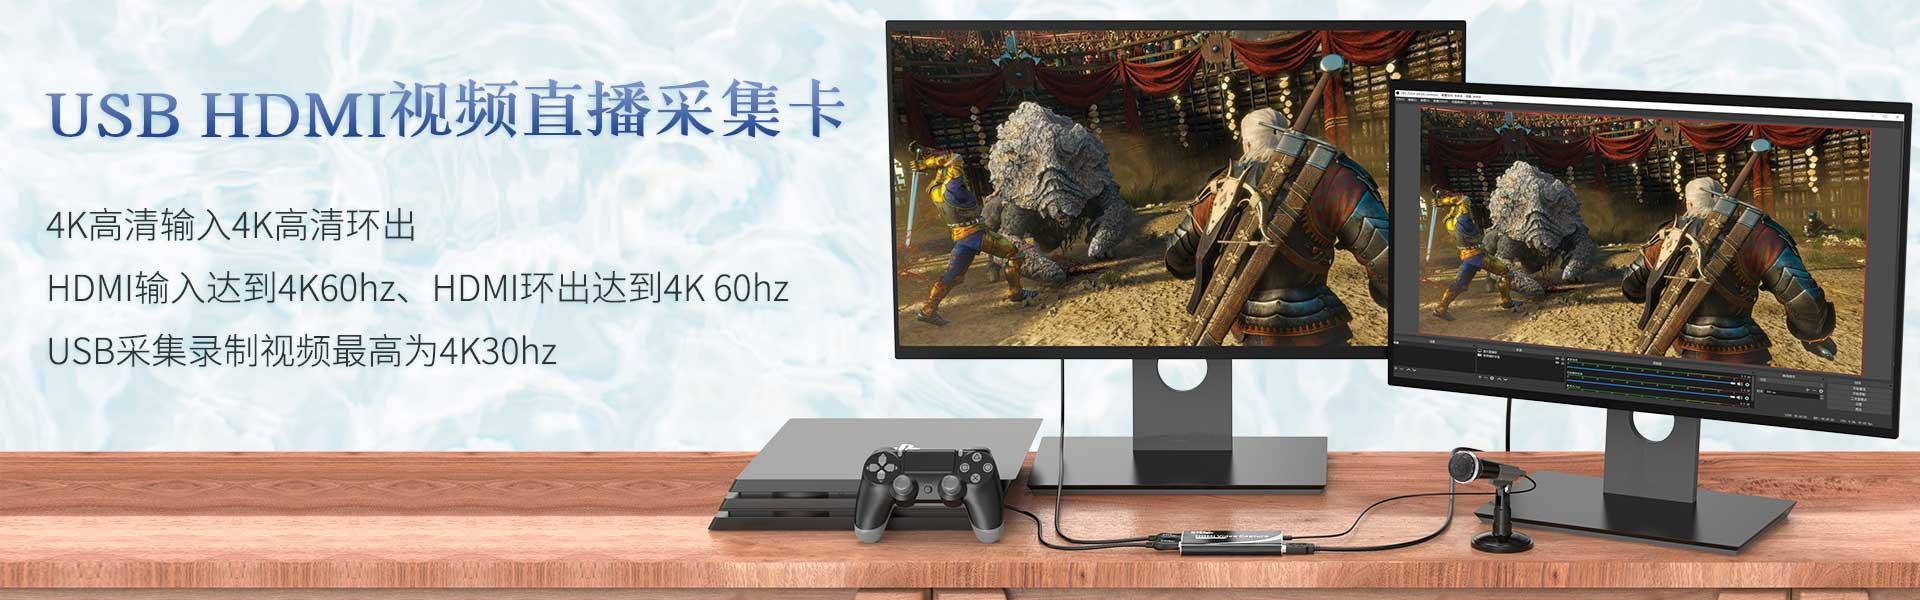 USB3.0 HDMI视频采集卡HUC03